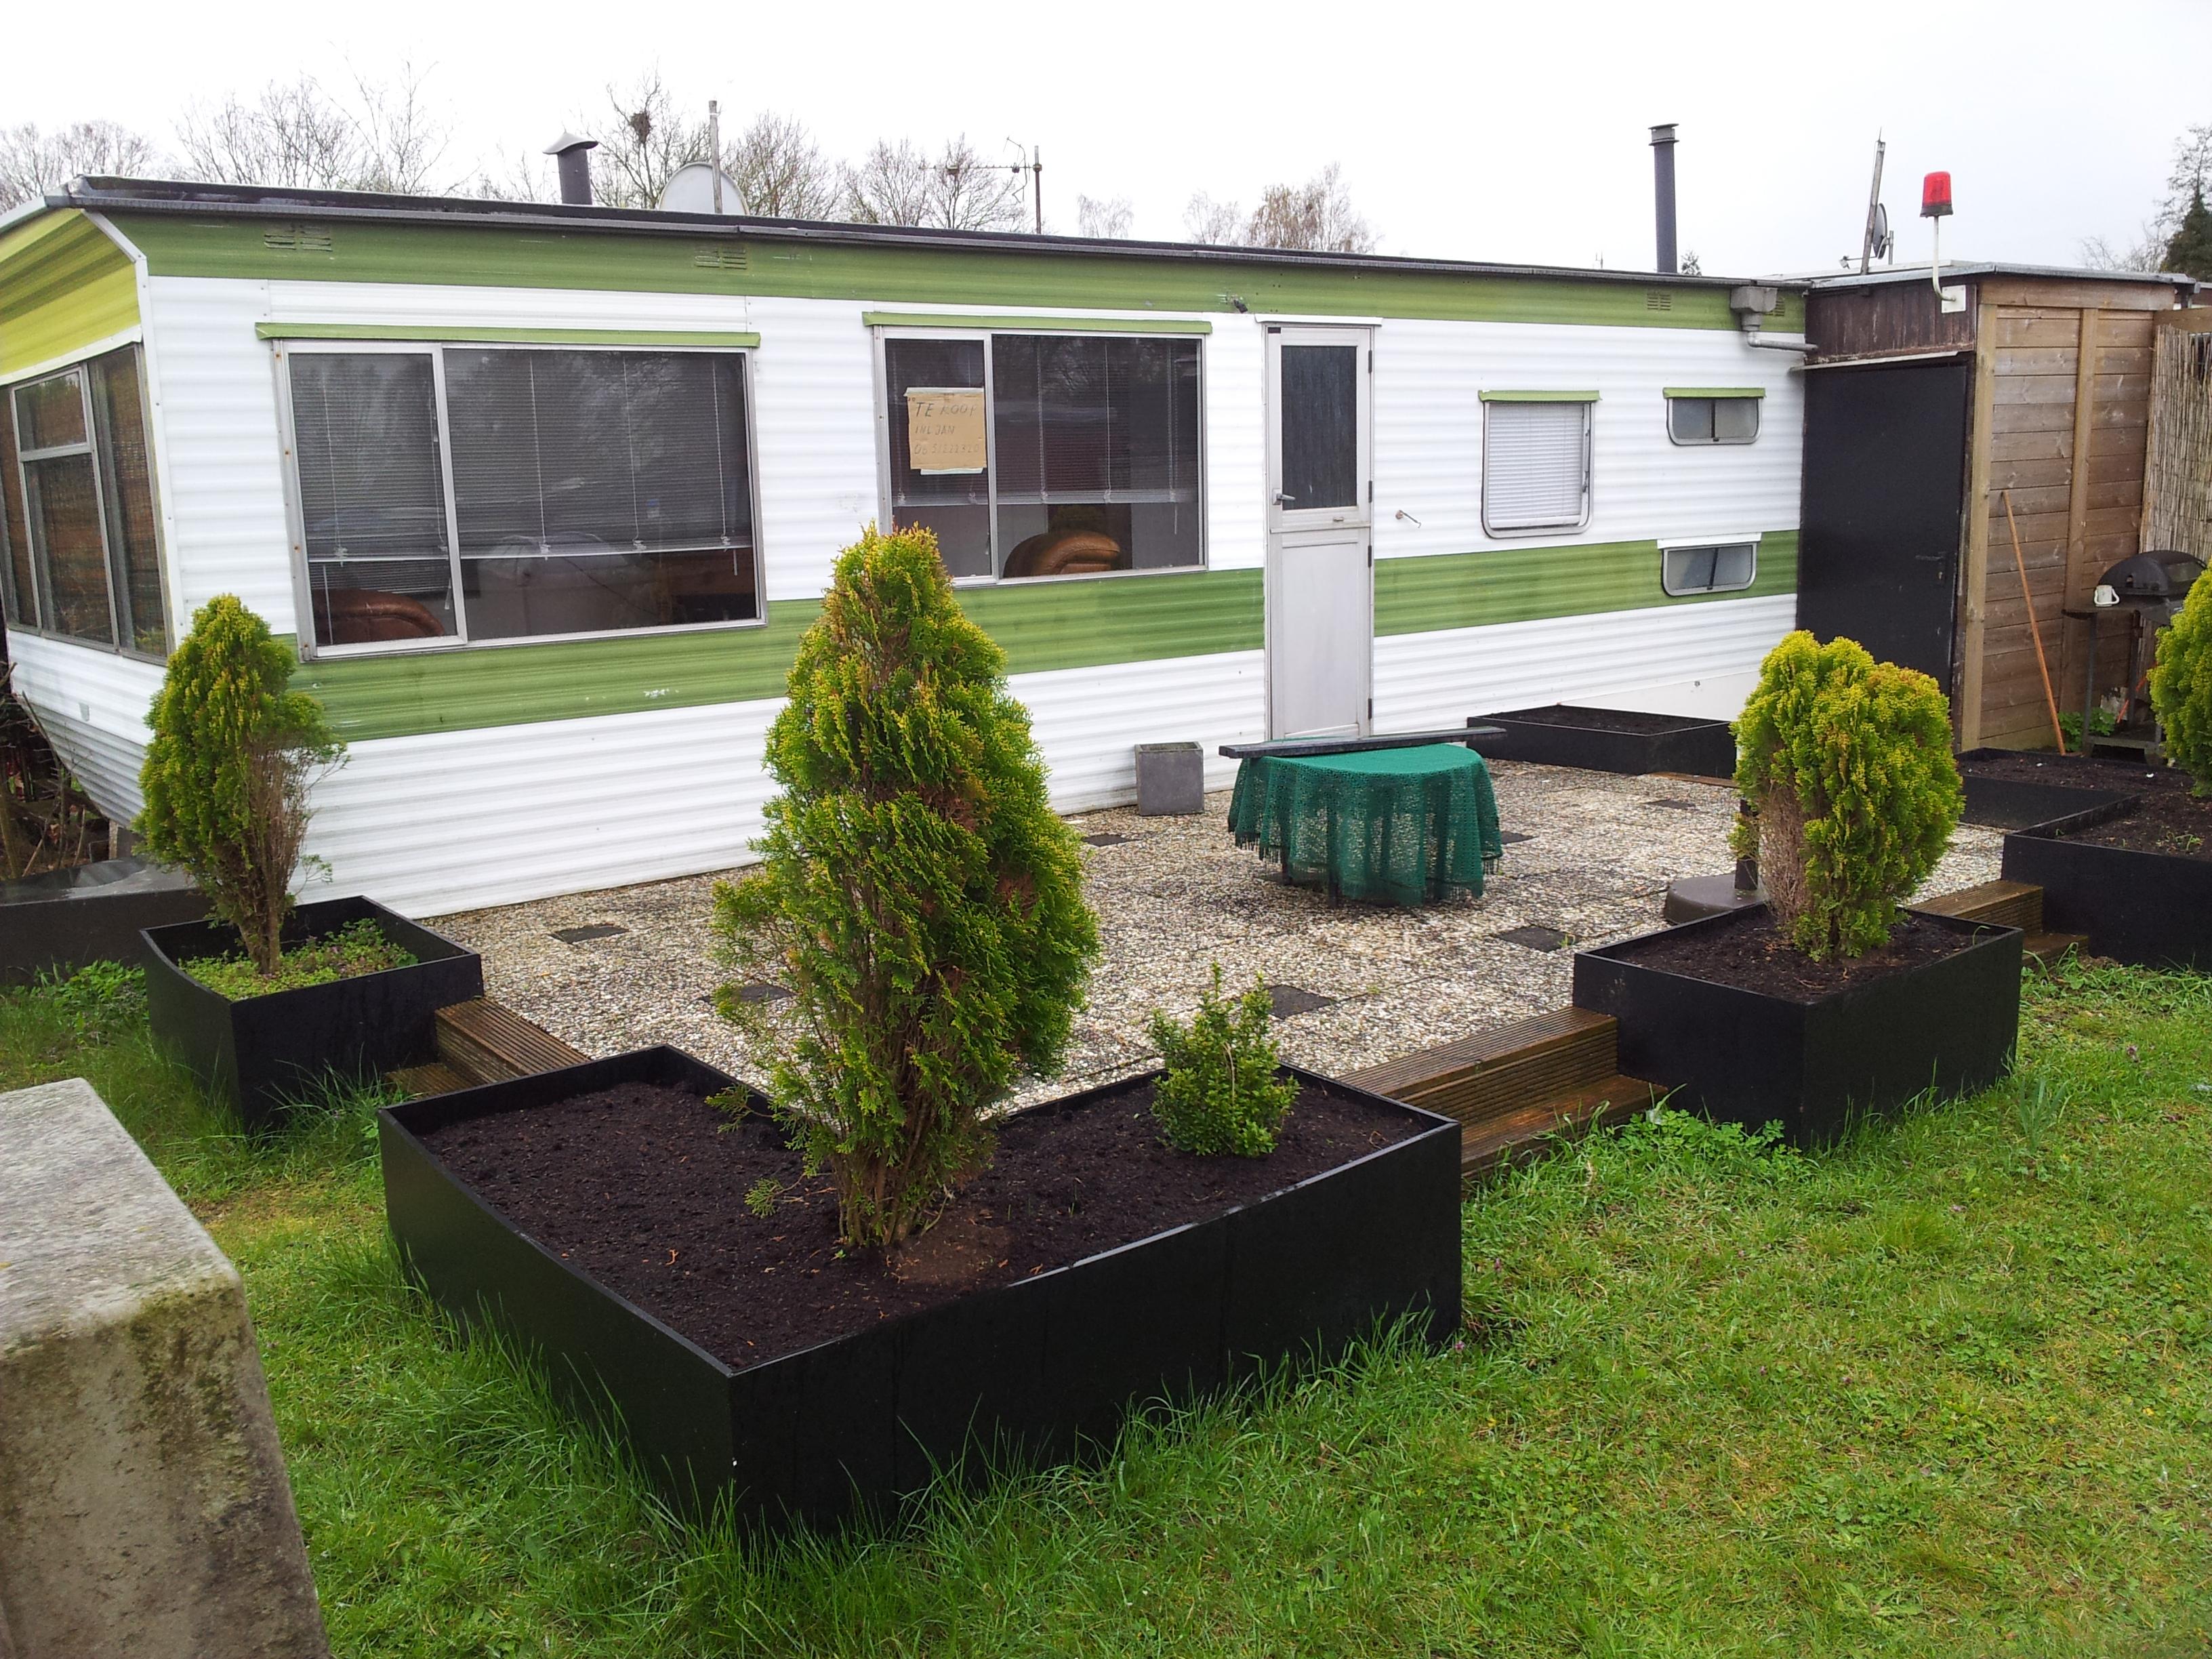 Mobilheime Xanten : Camping kleinanzeigen in xanten